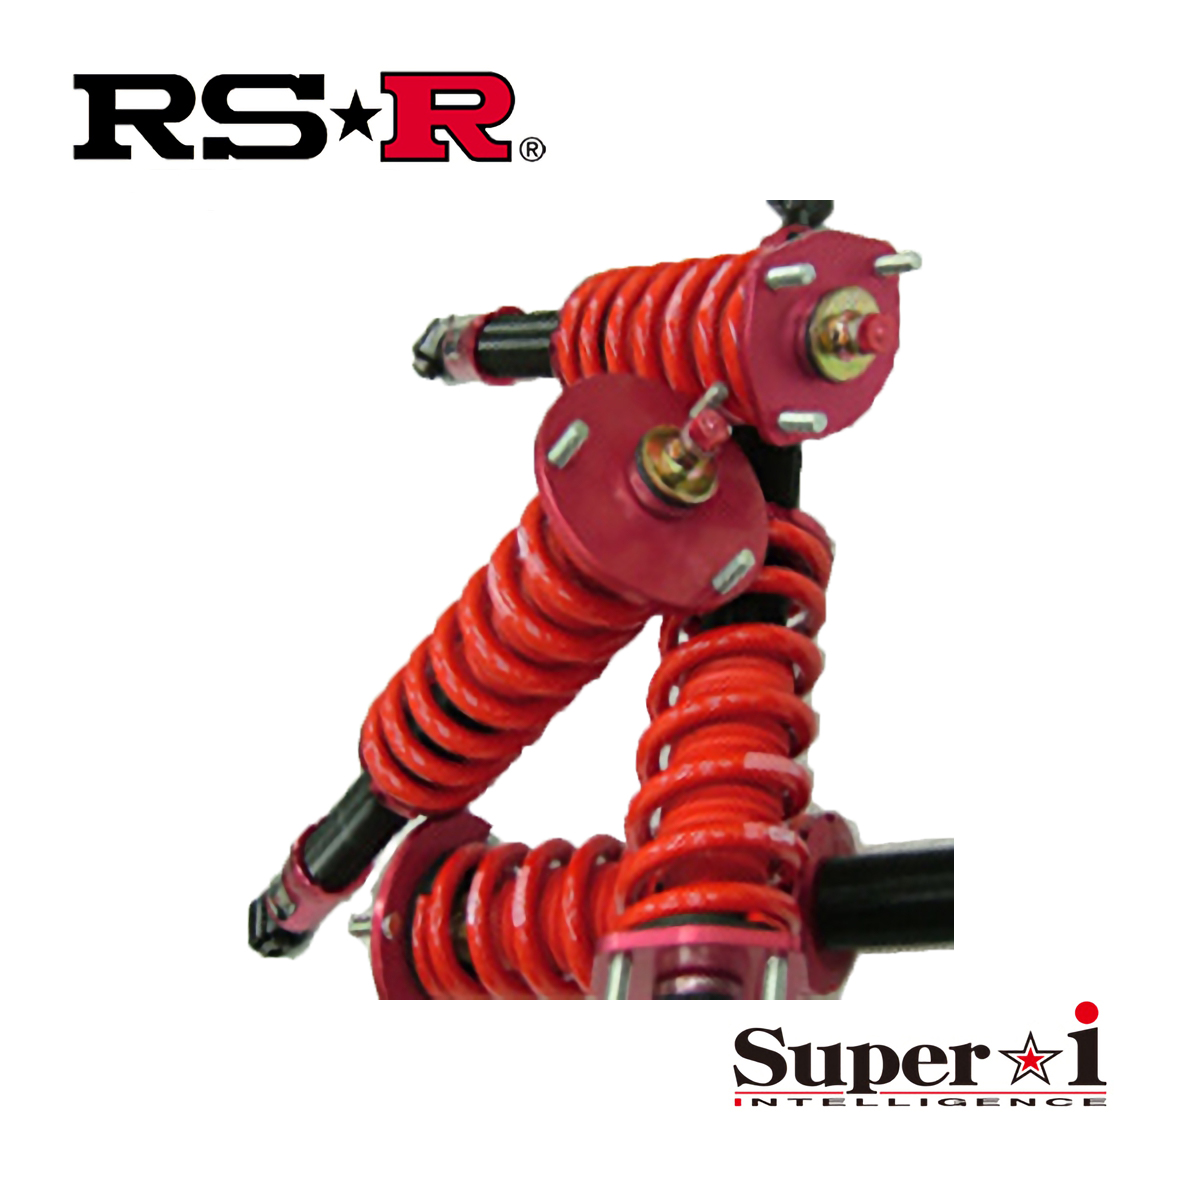 RS★R エスティマ ACR50W 車高調 推奨仕様商品コード:SIT500M ソフト仕様商品コード:SIT500S ハード仕様商品コード:SIT500H RSR 条件付き送料無料